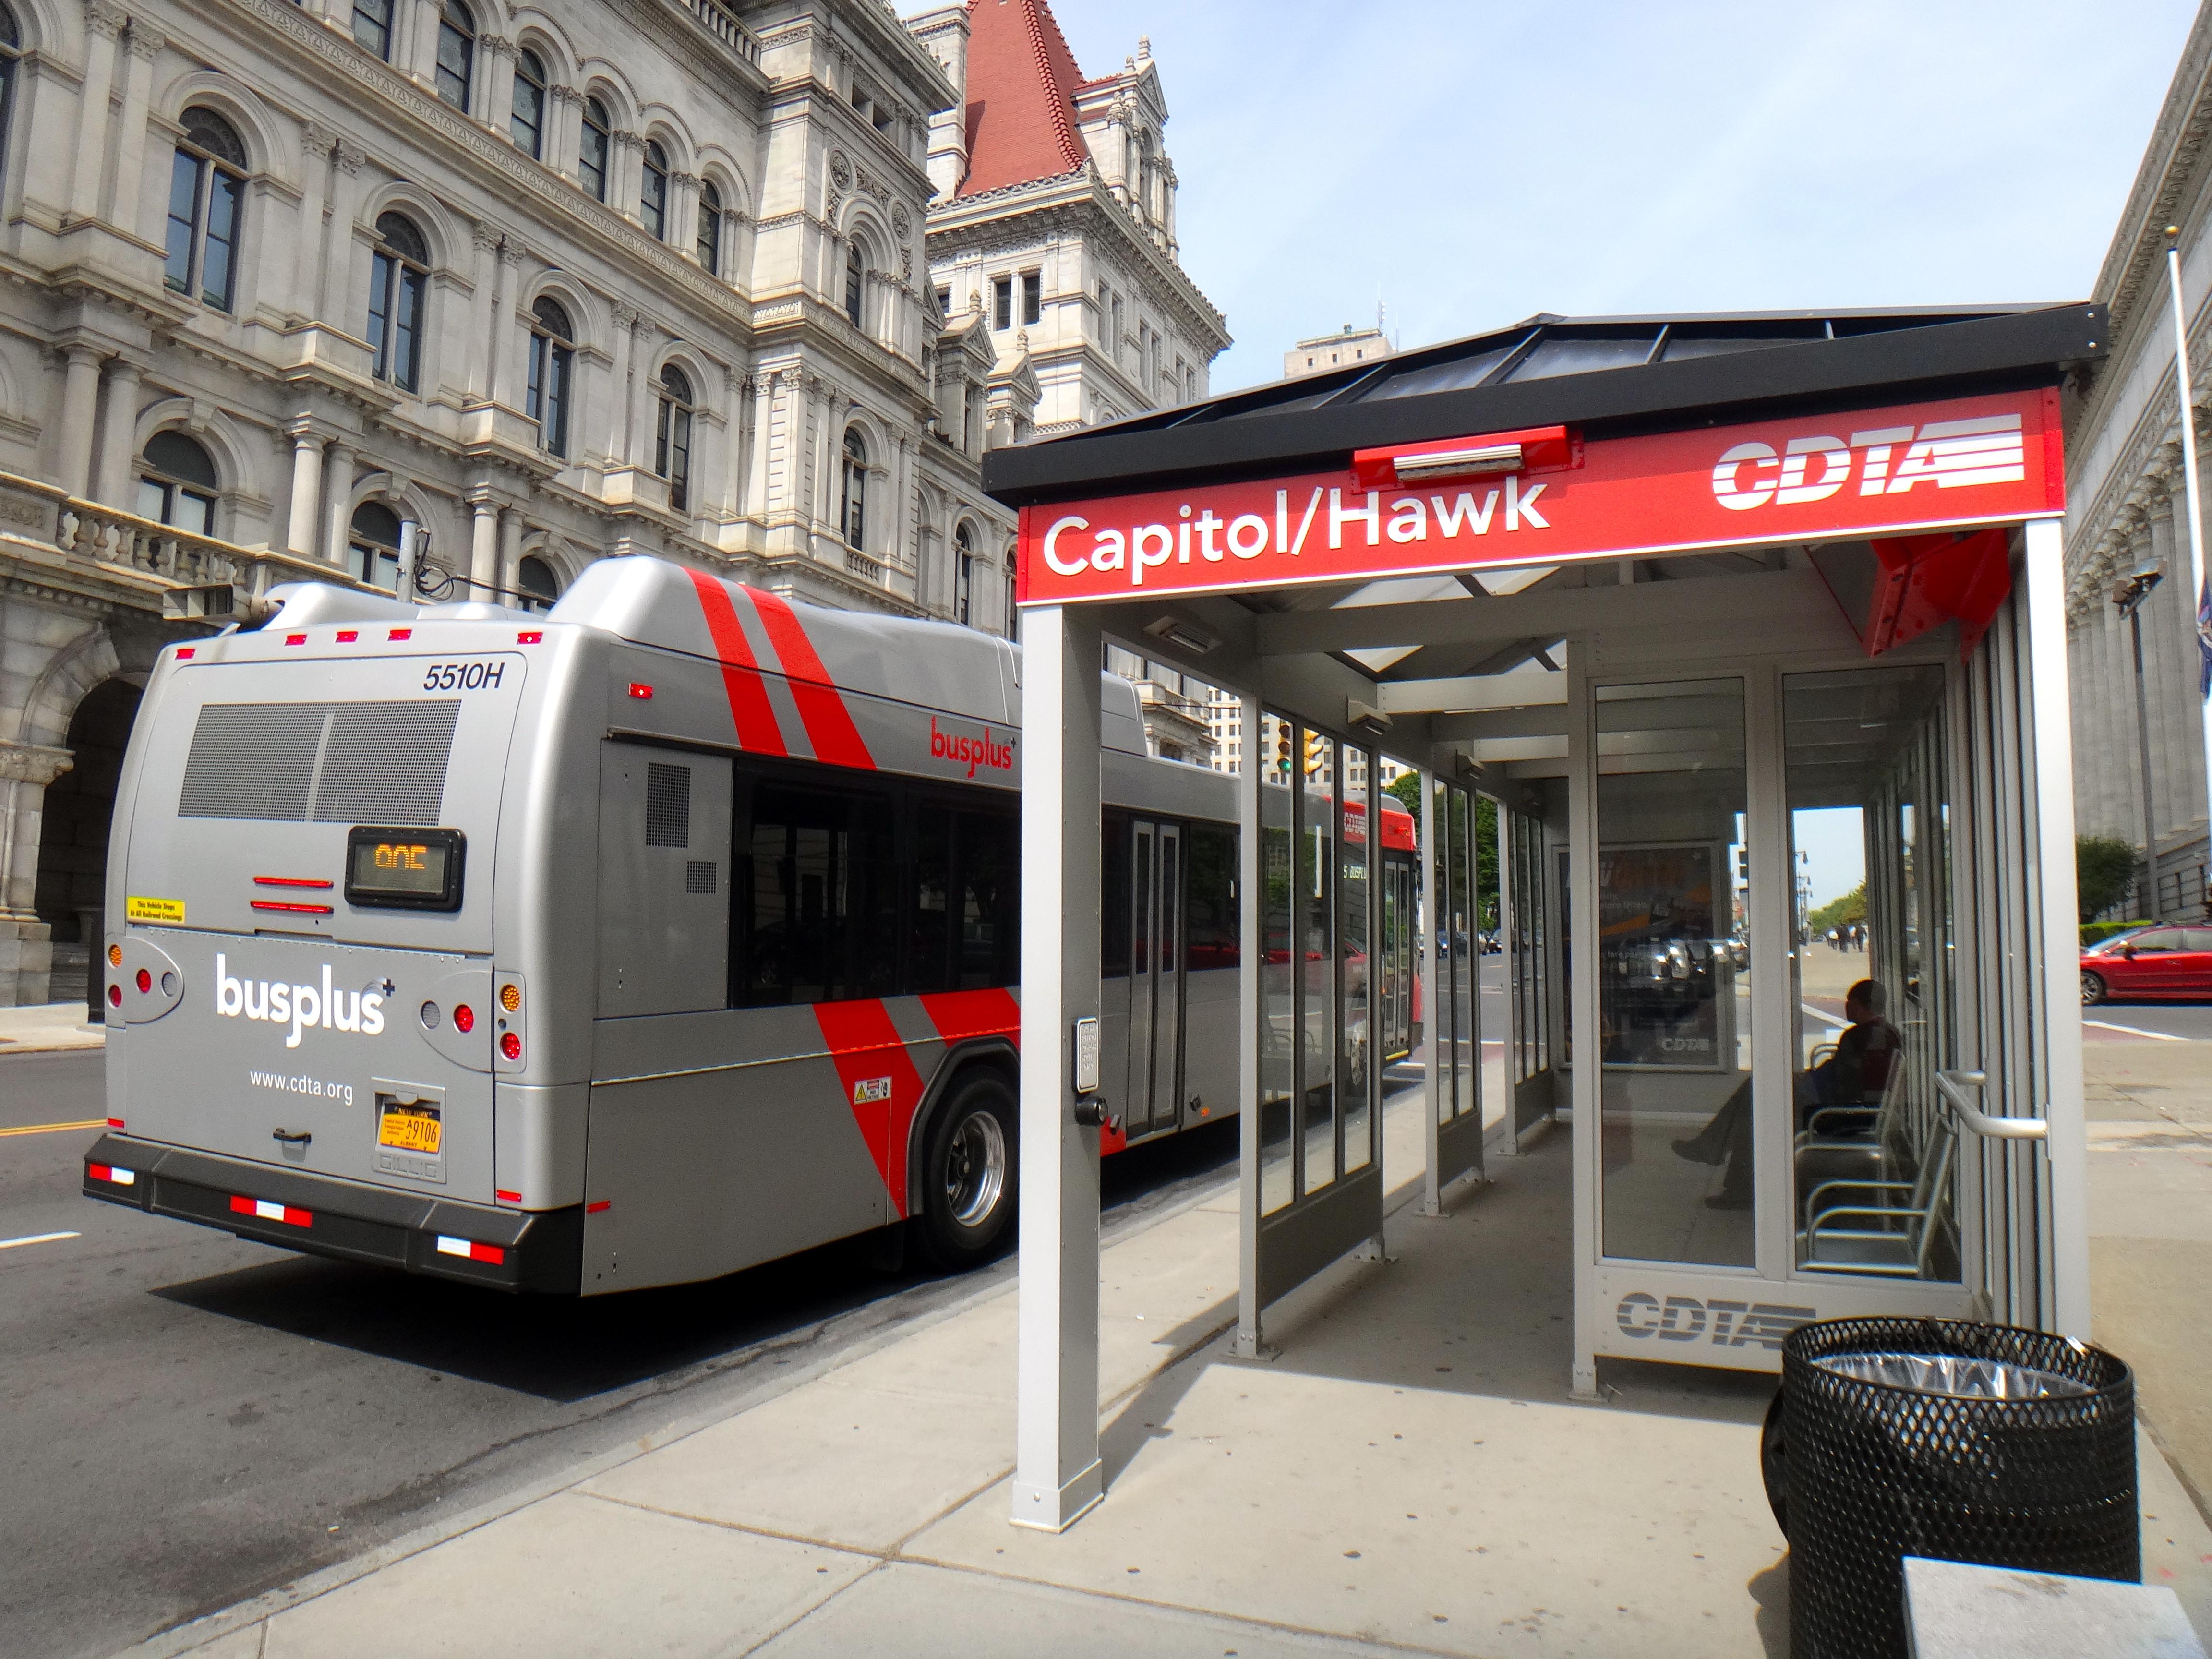 85 bus schedule cdta